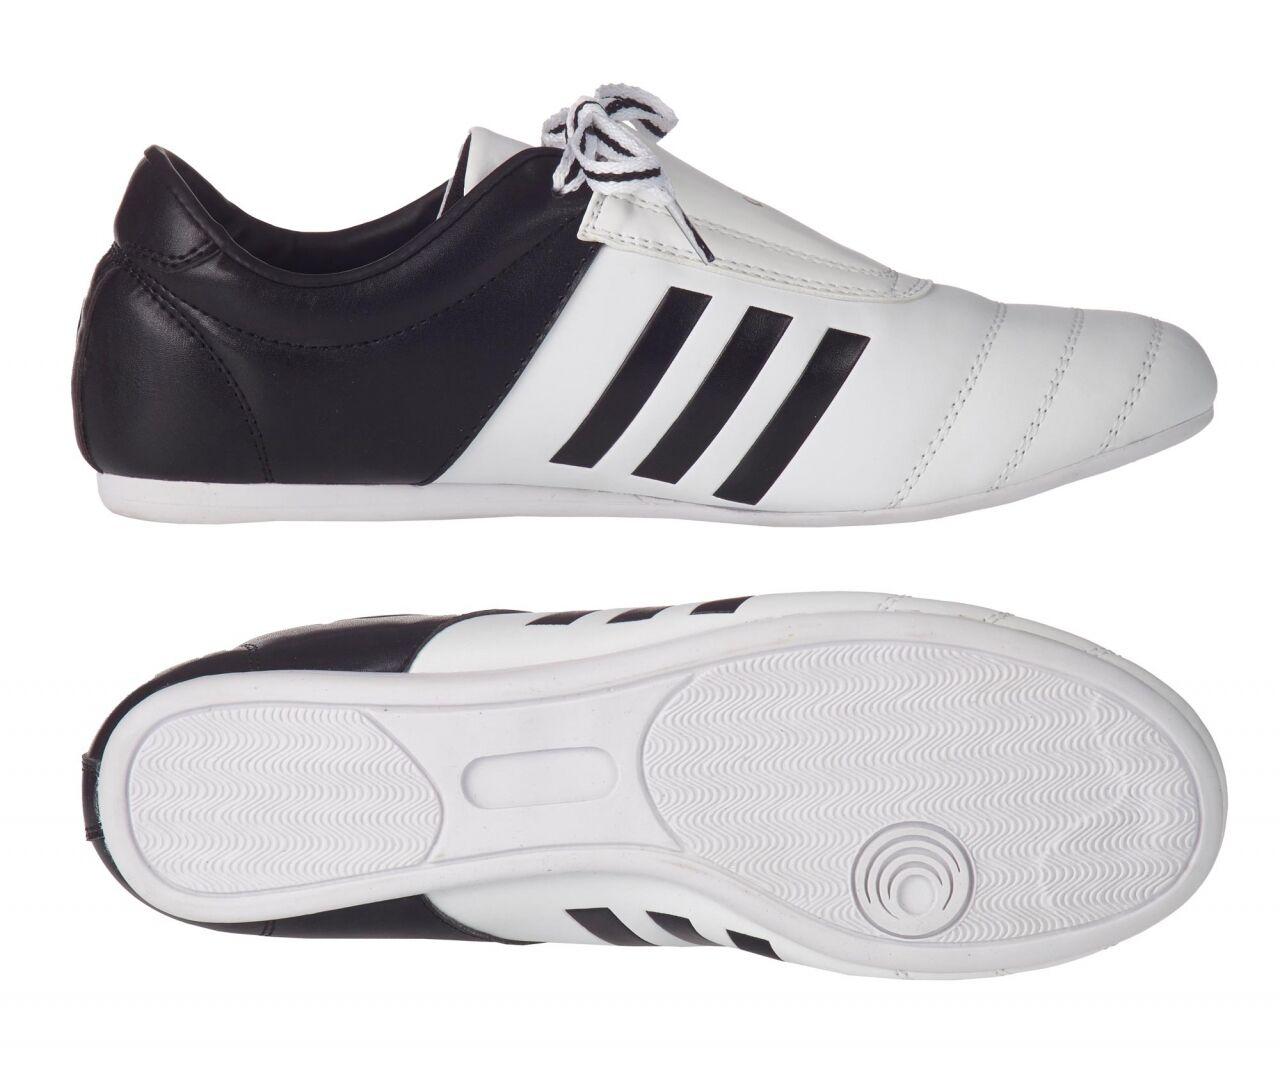 Adidas Turnschuhe Adi-Kick II ECO. Abriebfest. Budo. Sport. Taekwondo. Karate